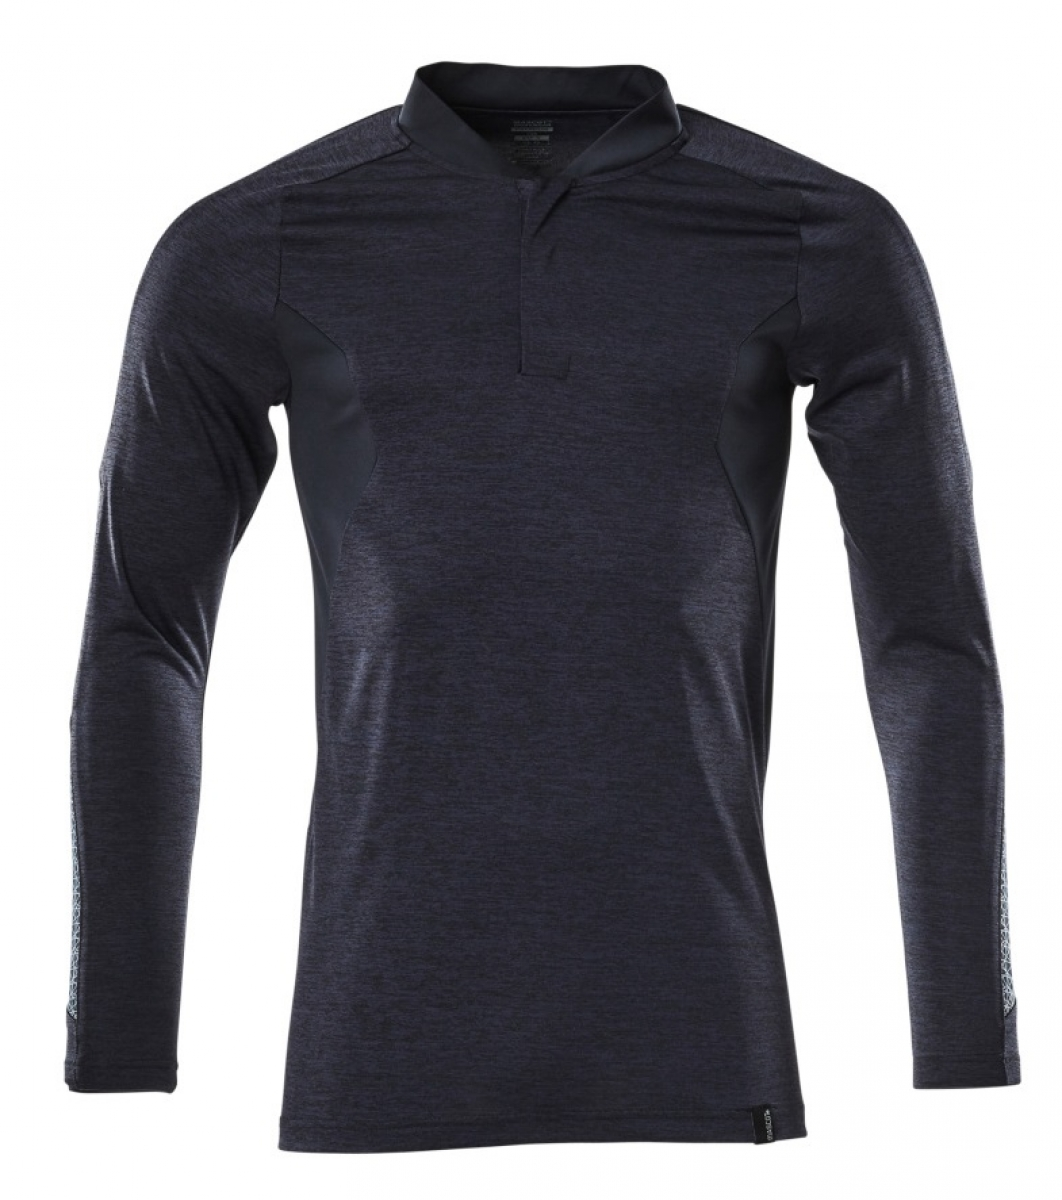 MASCOT-Polo-Shirt, langarm, ACCELERATE, 230 g/m², schwarzblau